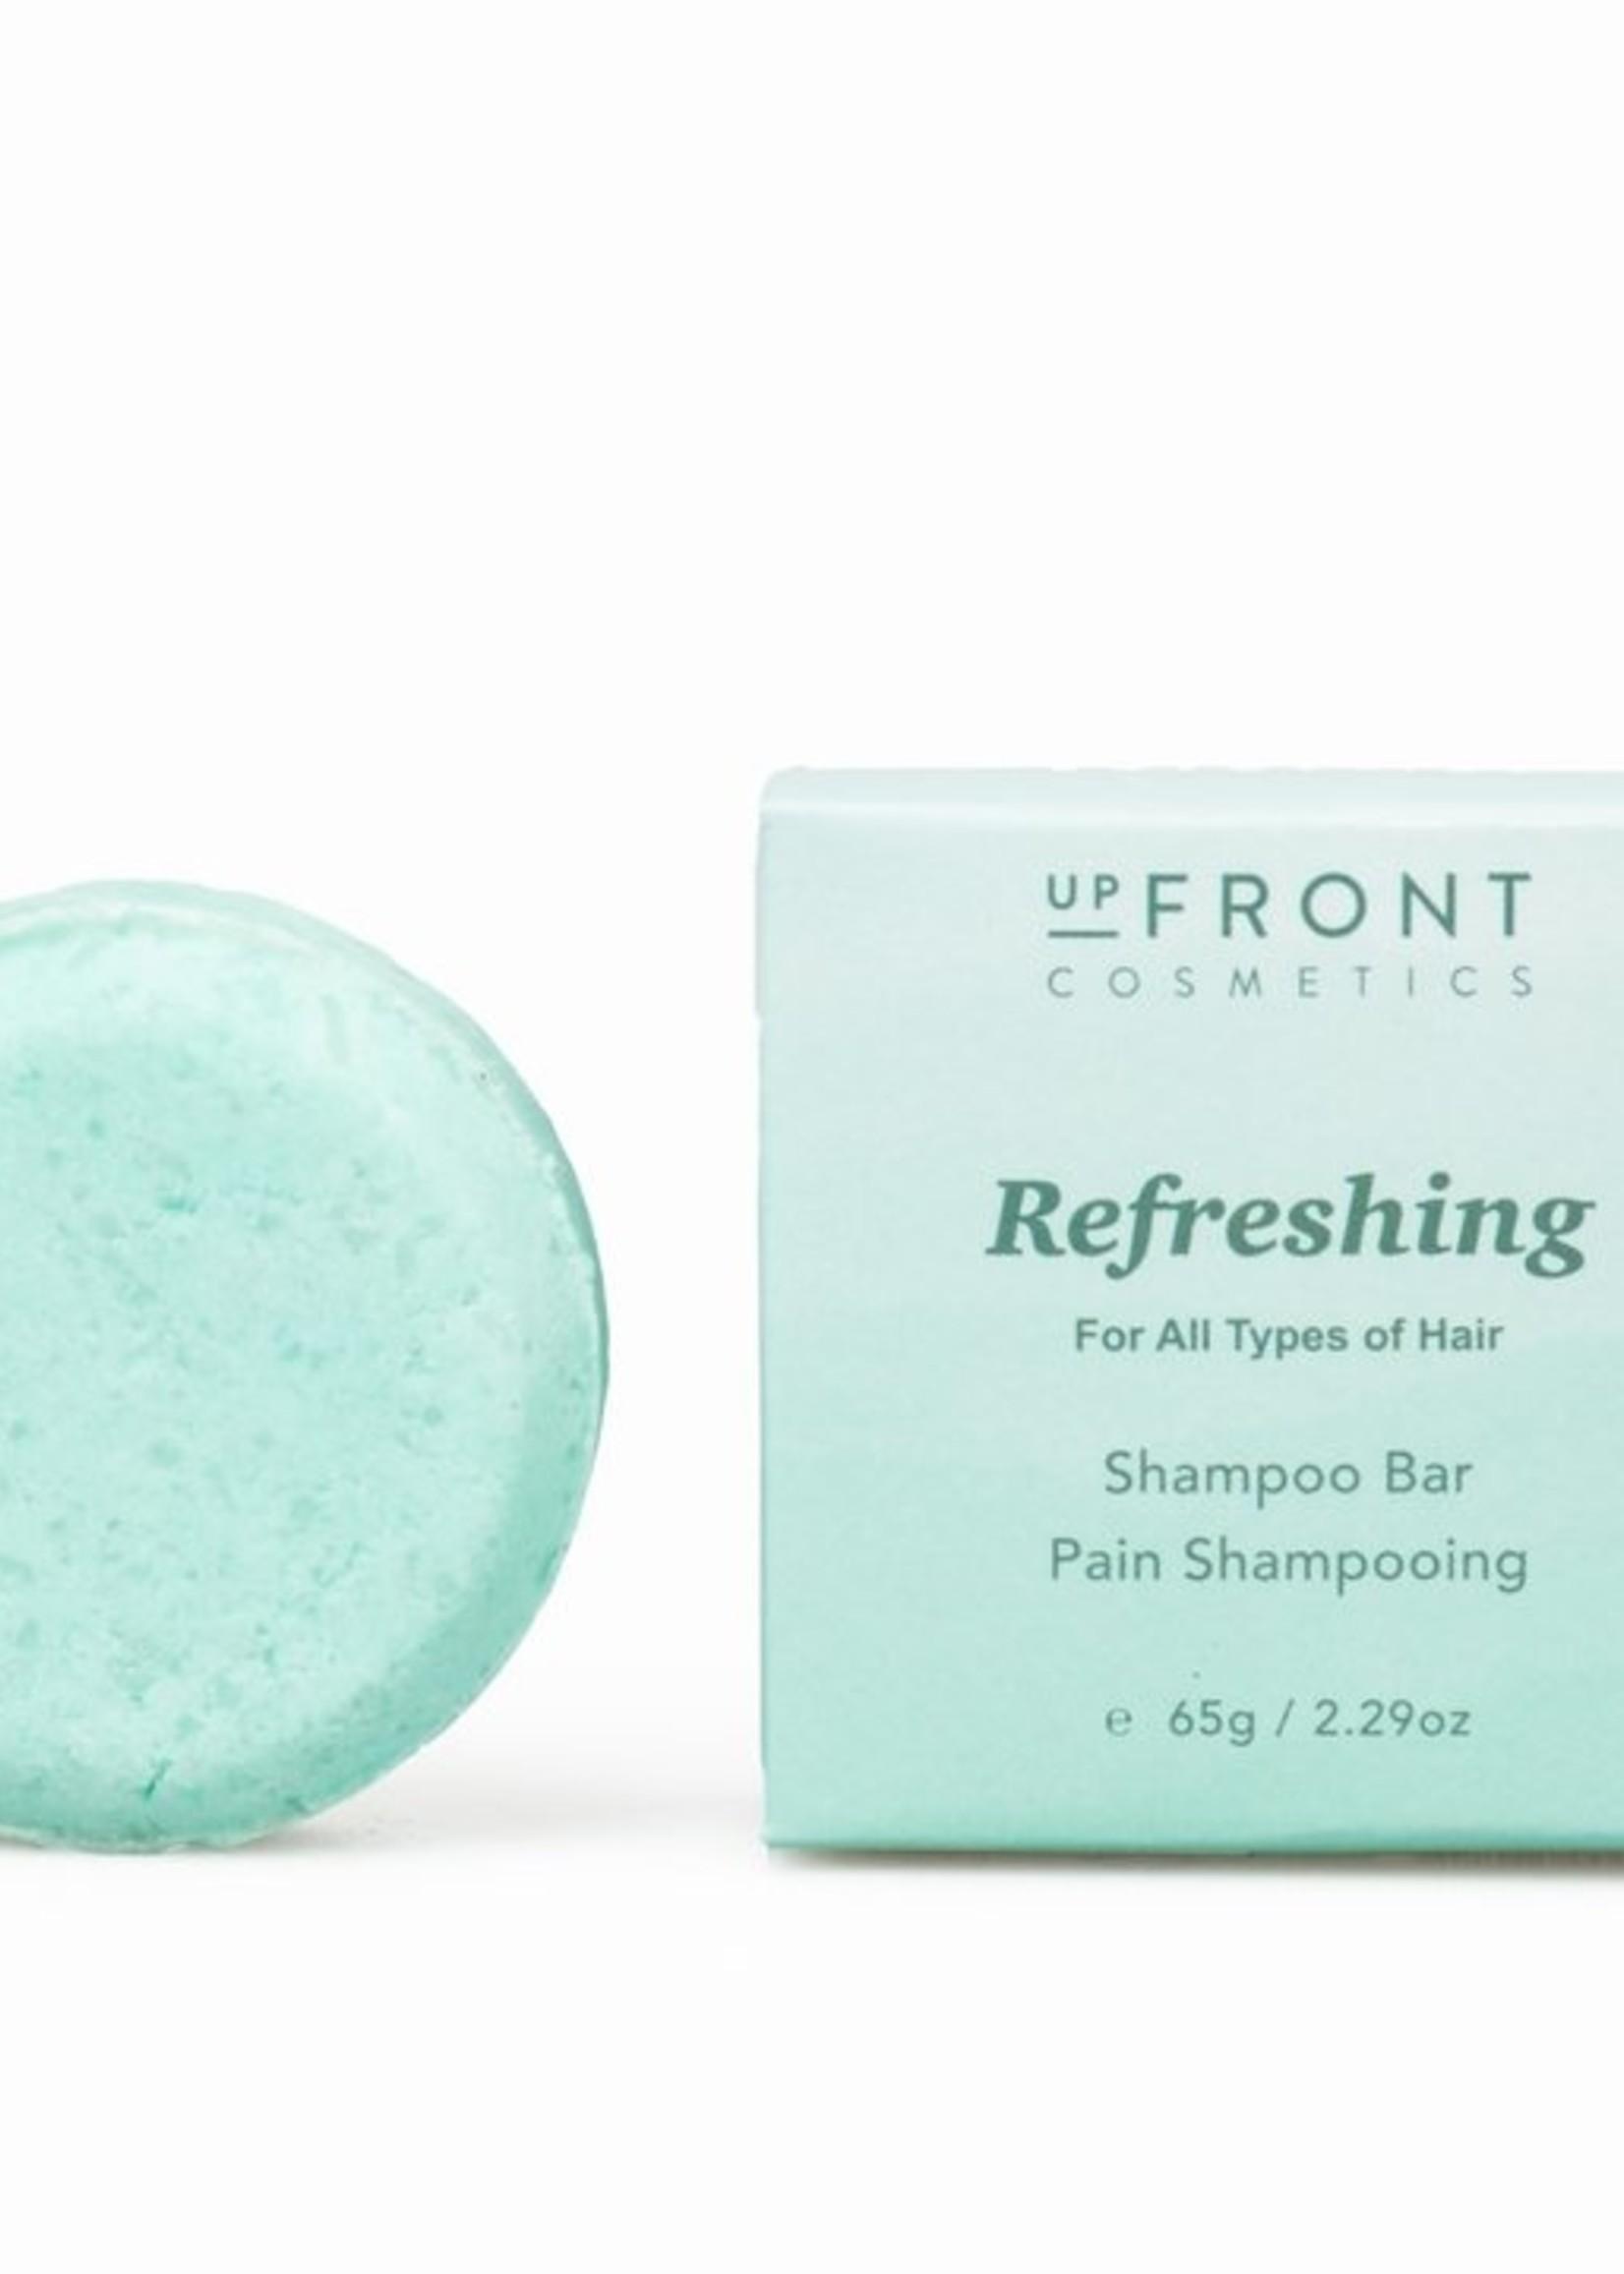 Upfront Cosmetics Refreshing Shampoo Bar for Normal Hair